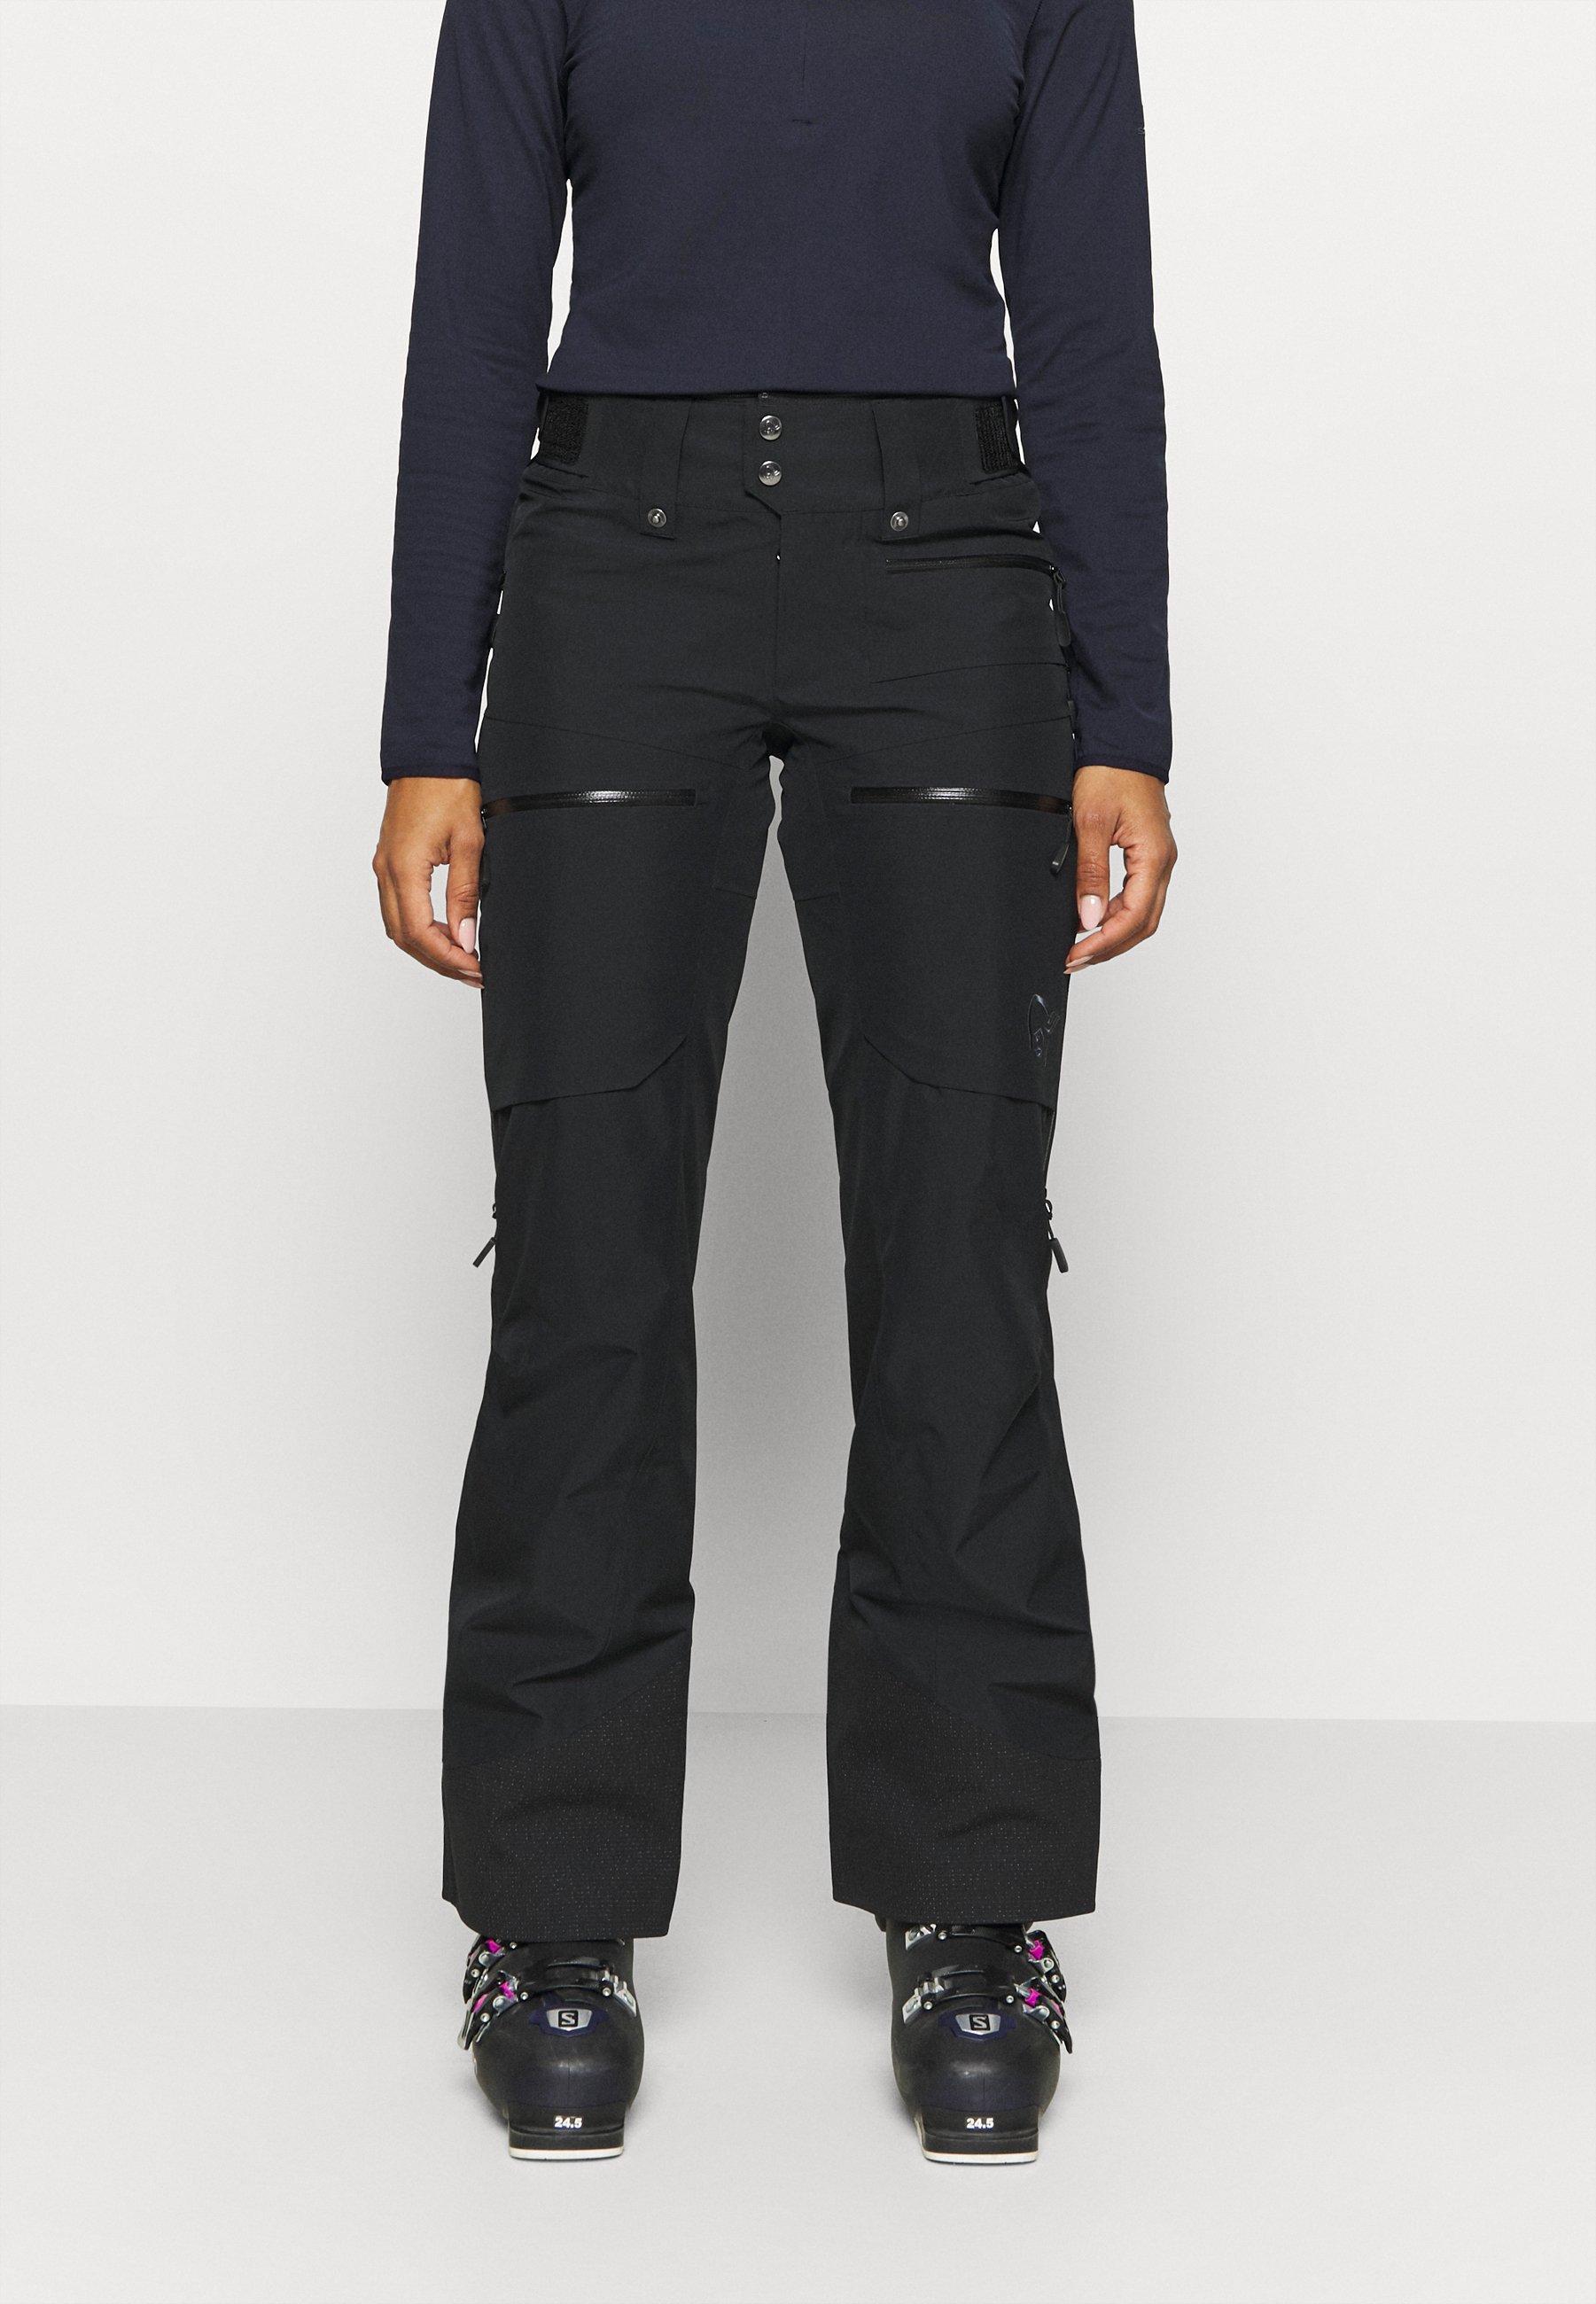 Femme LOFOTEN GORE-TEX INSULATED PANTS - Pantalon de ski